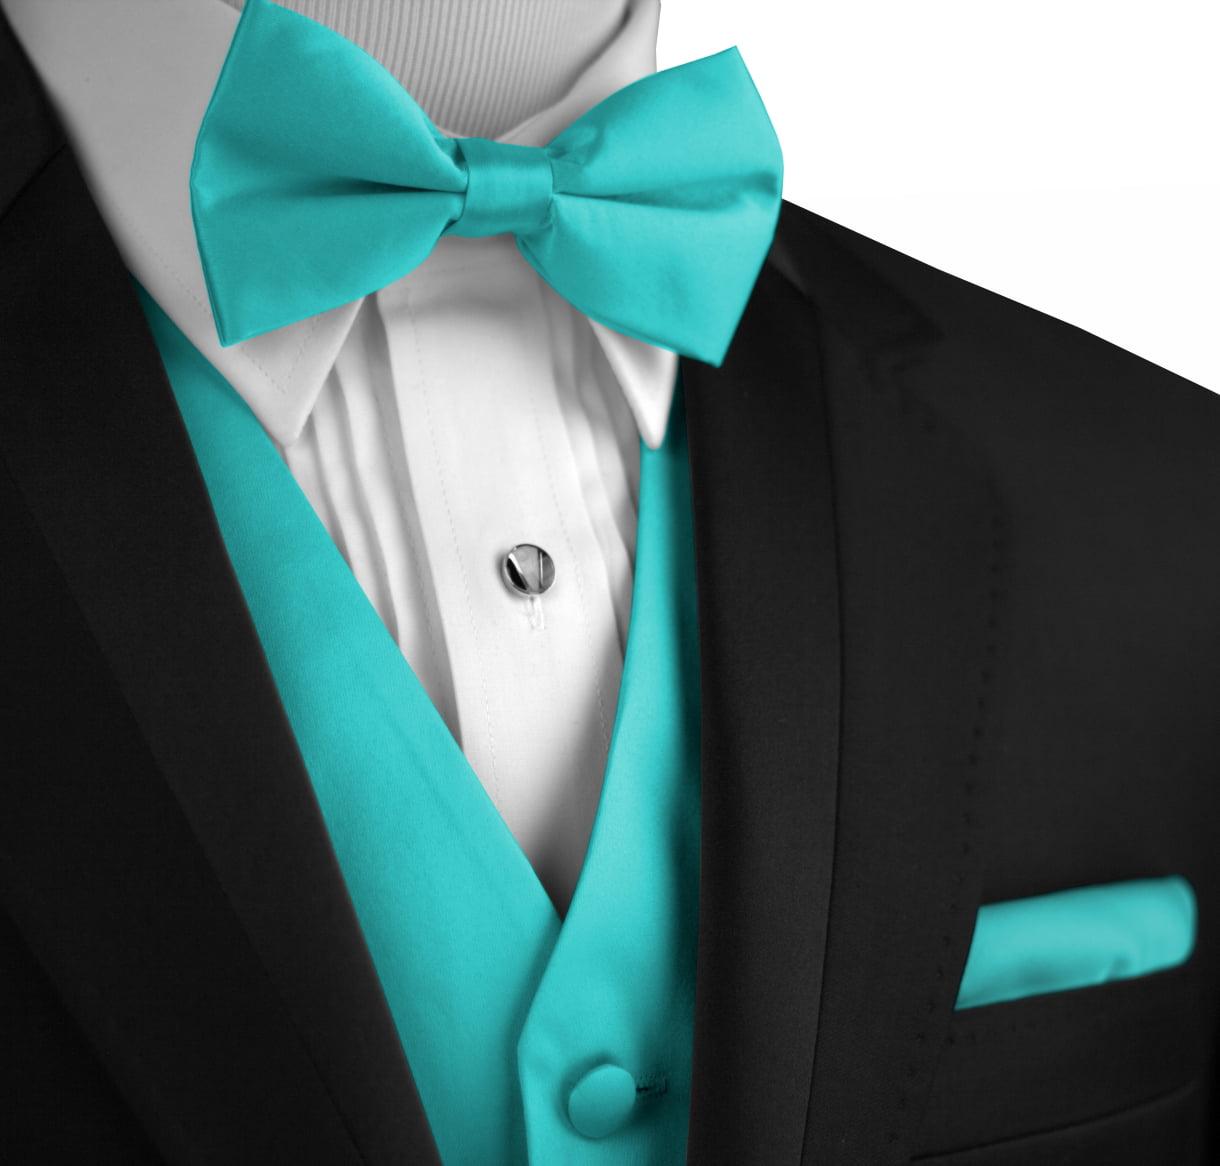 Italian Design, Men's Tuxedo Vest, Bow-Tie & Hankie Set in Teal